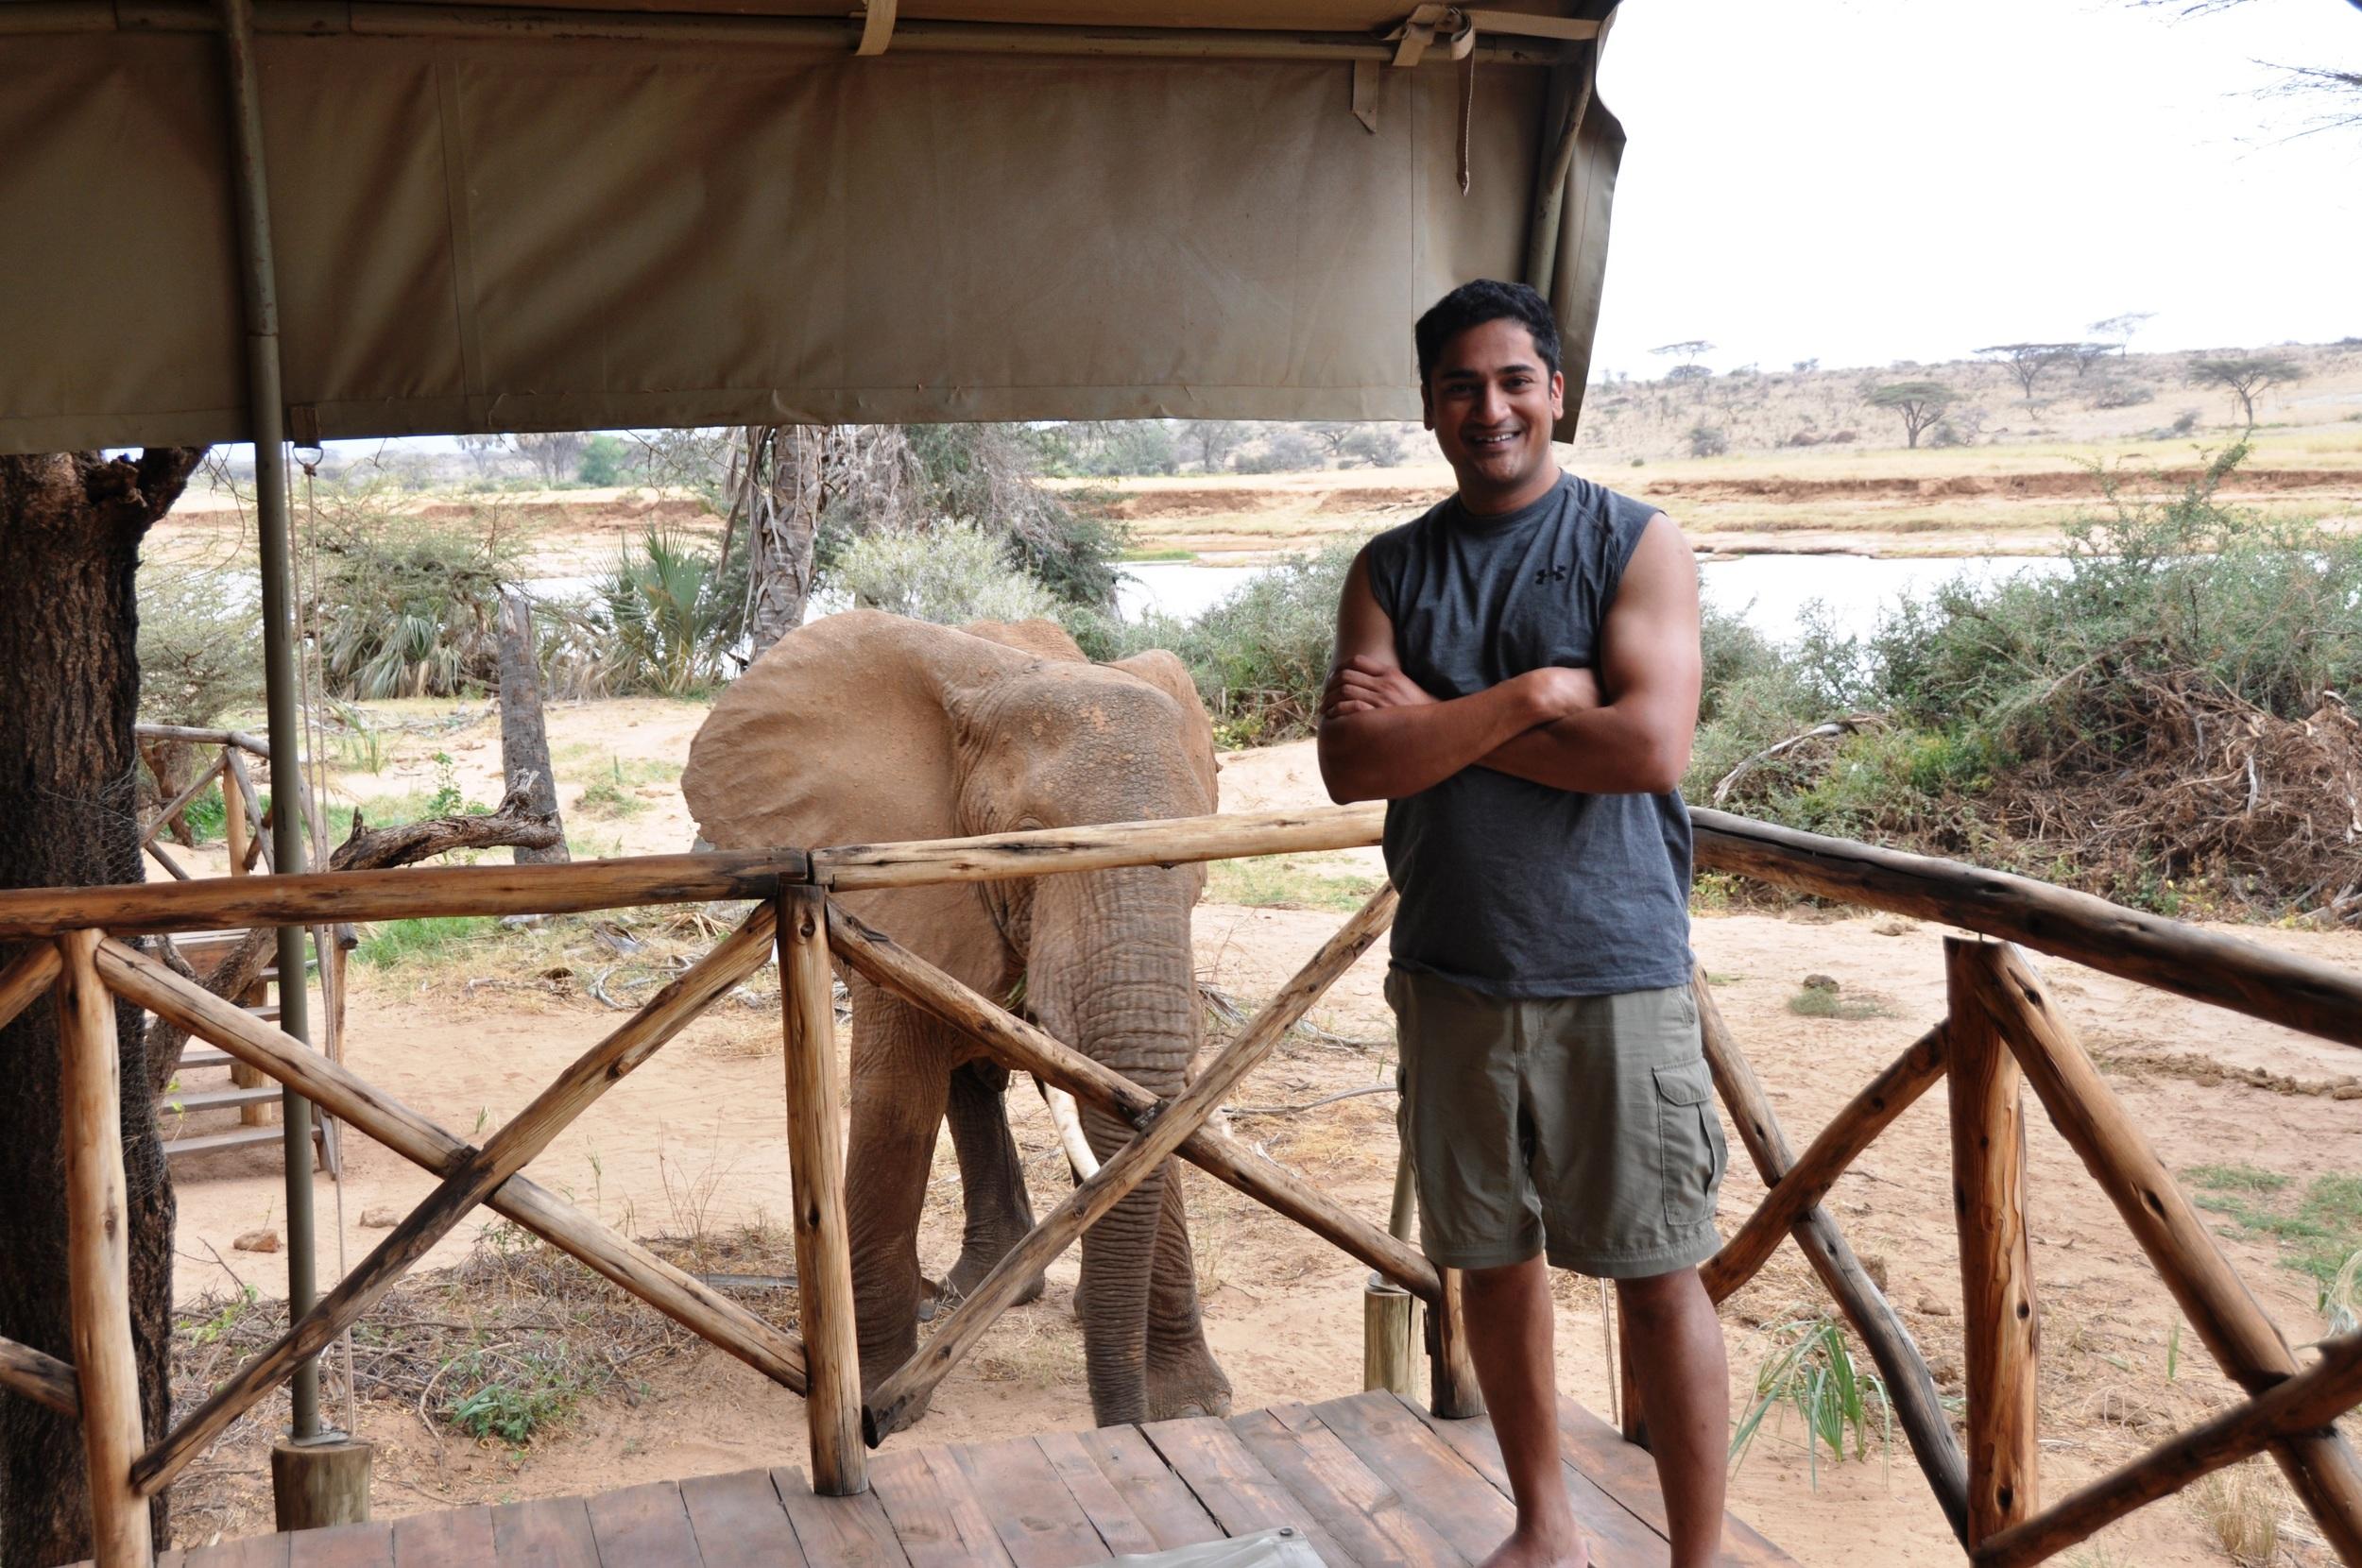 Elephant Bedroom Camp - Samburu, Kenya, Africa